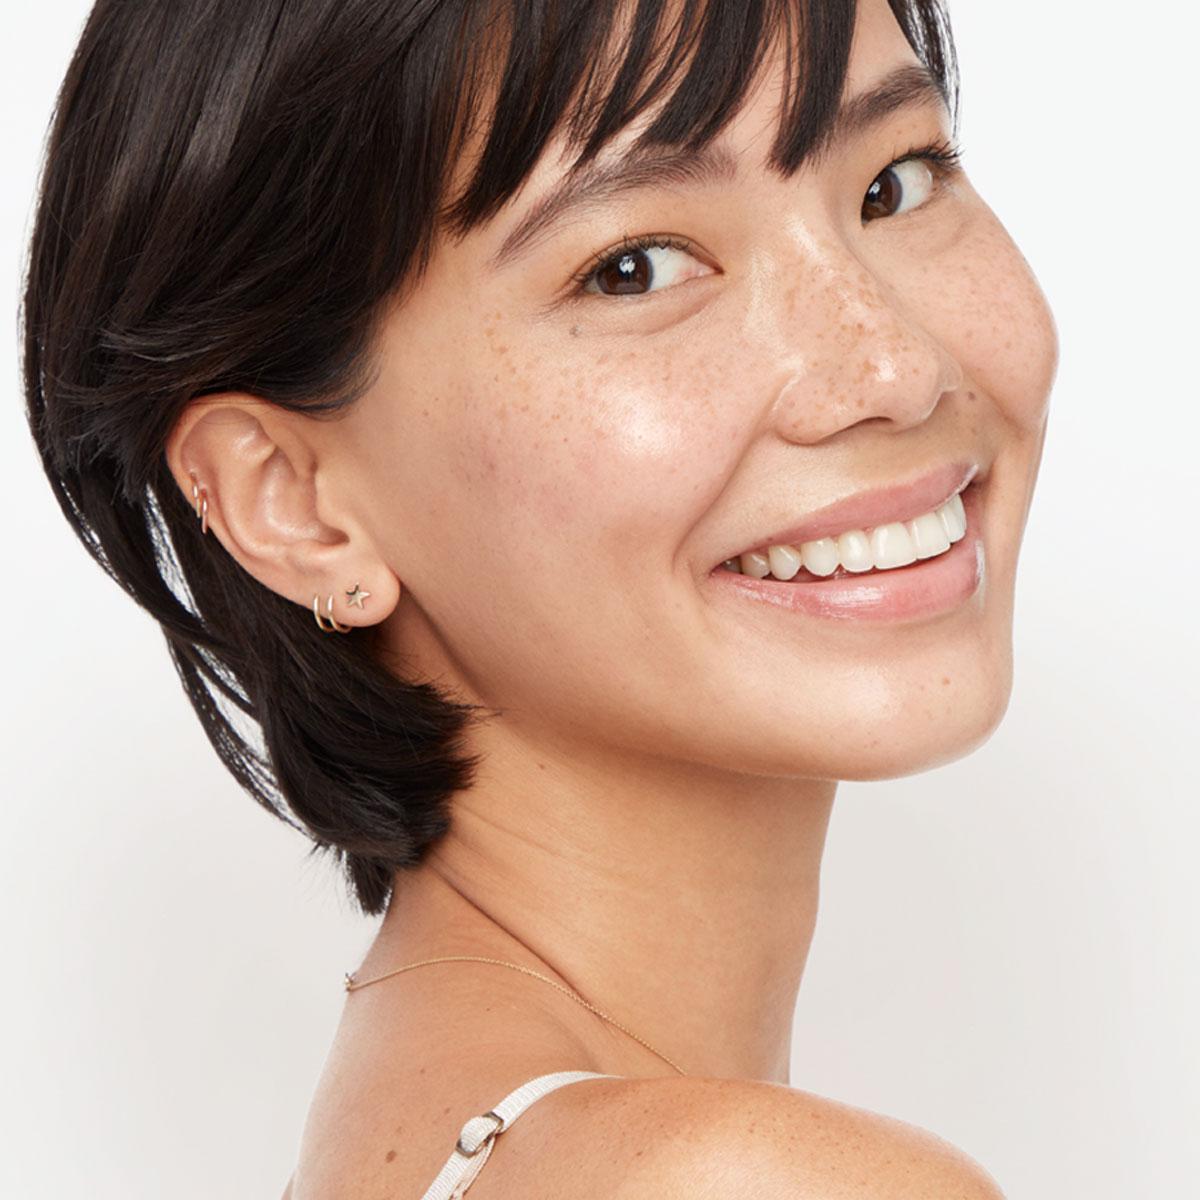 applying retinol on face img